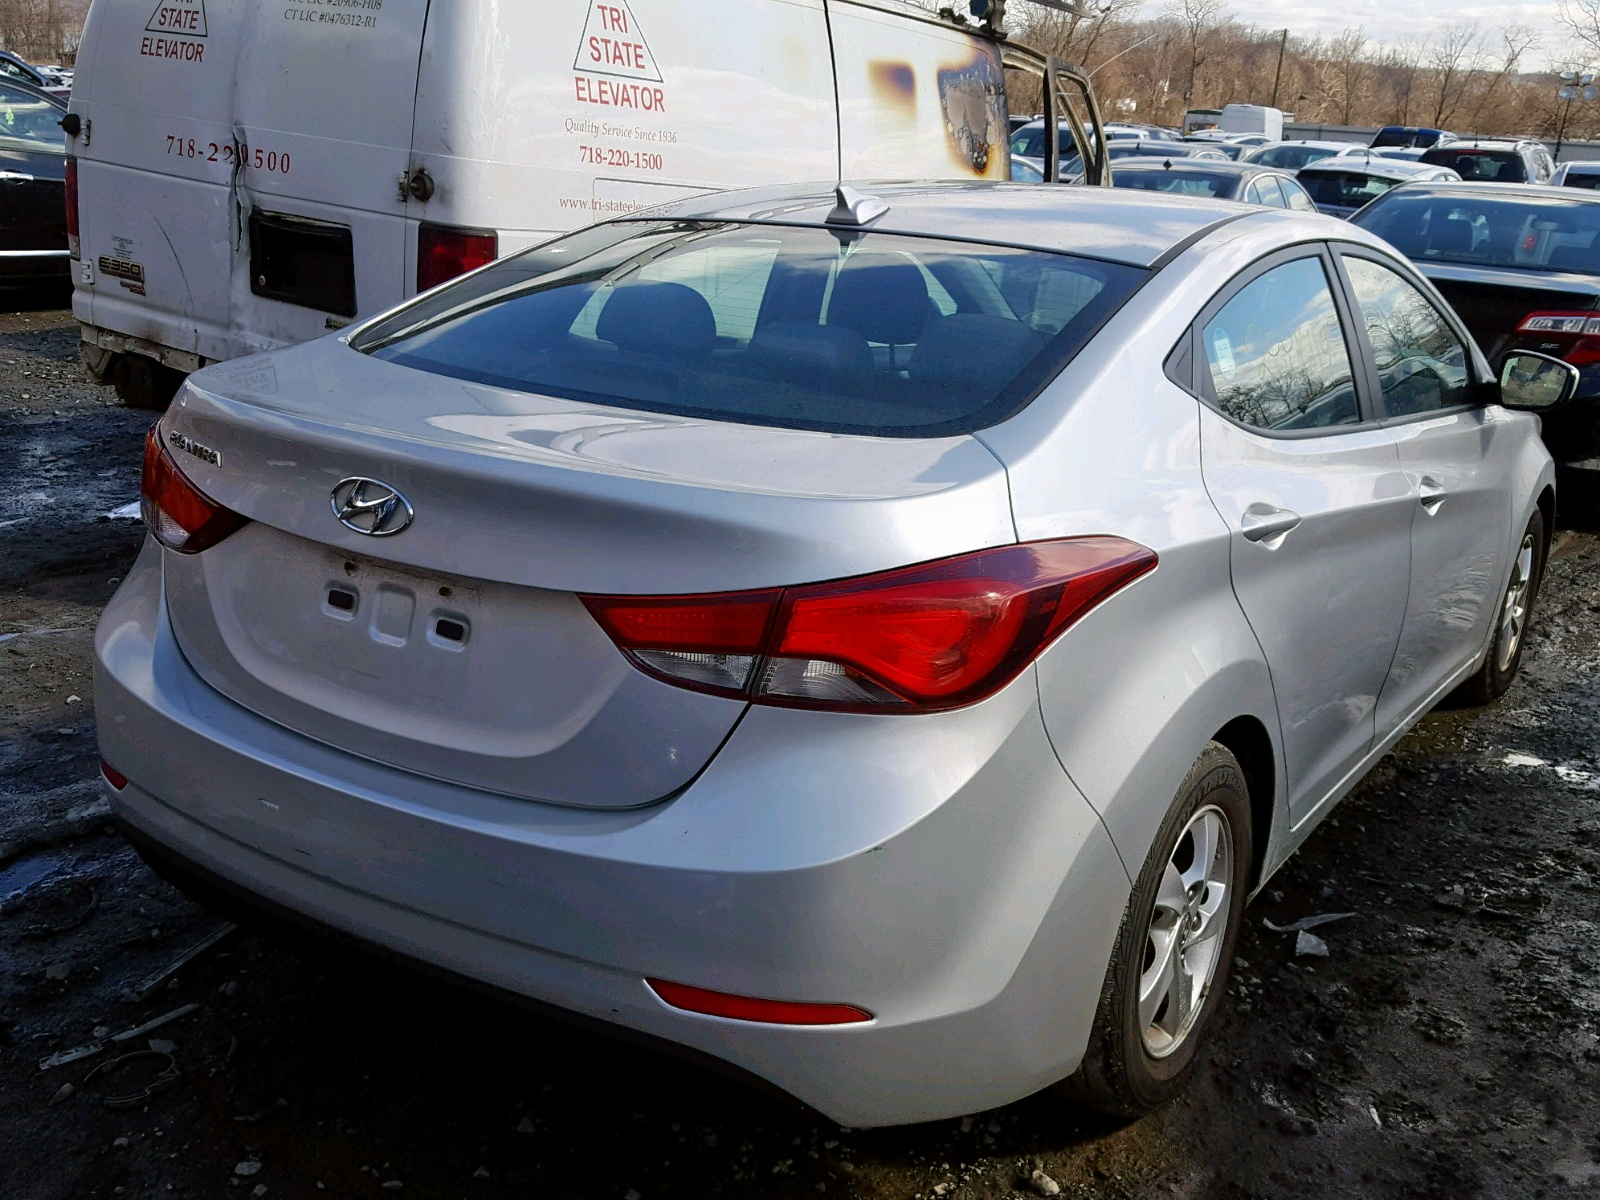 2015 Hyundai Elantra Se 1.8L rear view